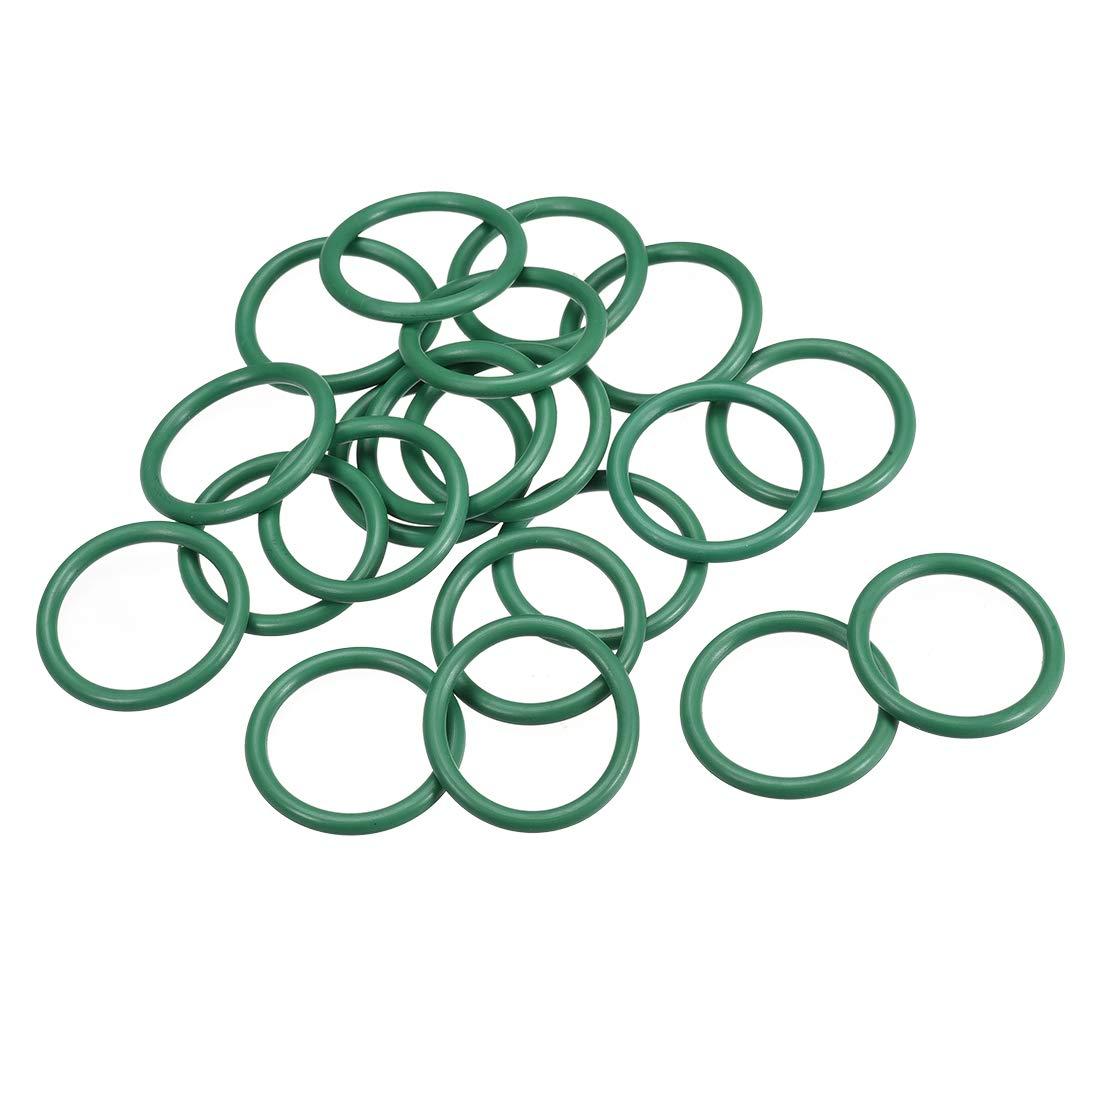 38mm OD 31.8mm Inner Diameter 3.1mm Width Seal Gasket Green 20Pcs uxcell Fluorine Rubber O Rings